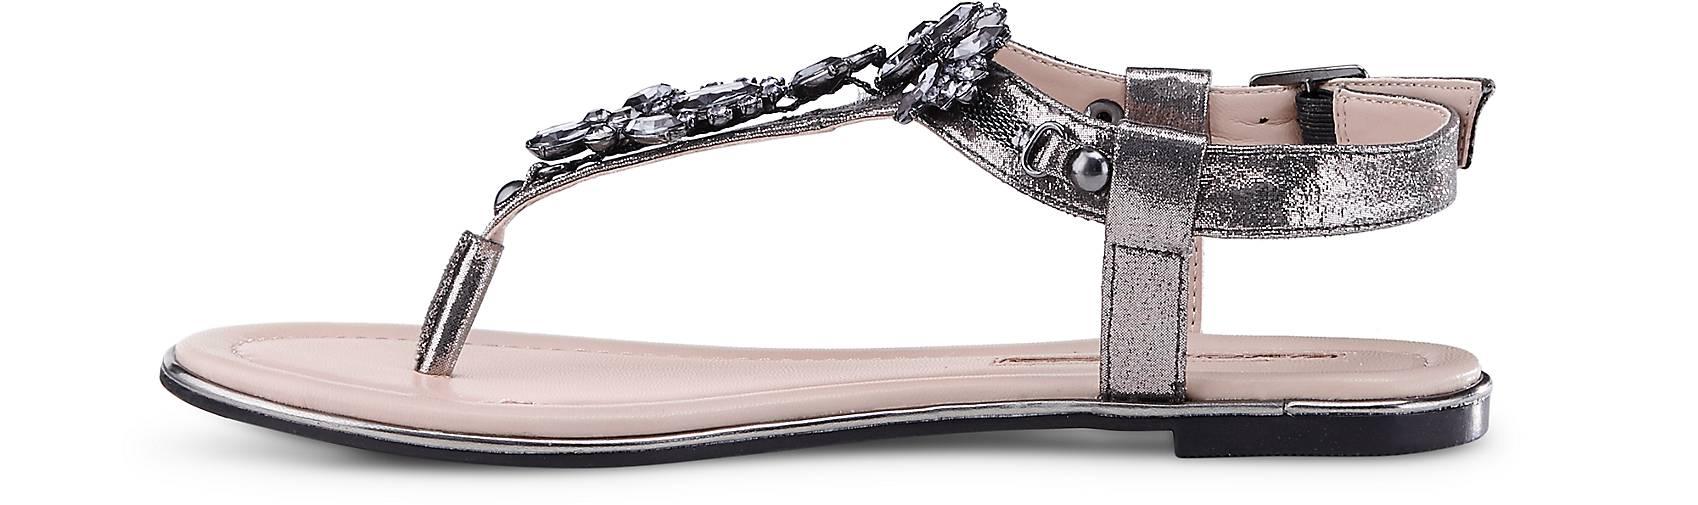 Buffalo Strass-Dianette in grau-dunkel grau-dunkel grau-dunkel kaufen - 46109501 GÖRTZ Gute Qualität beliebte Schuhe 0fce75